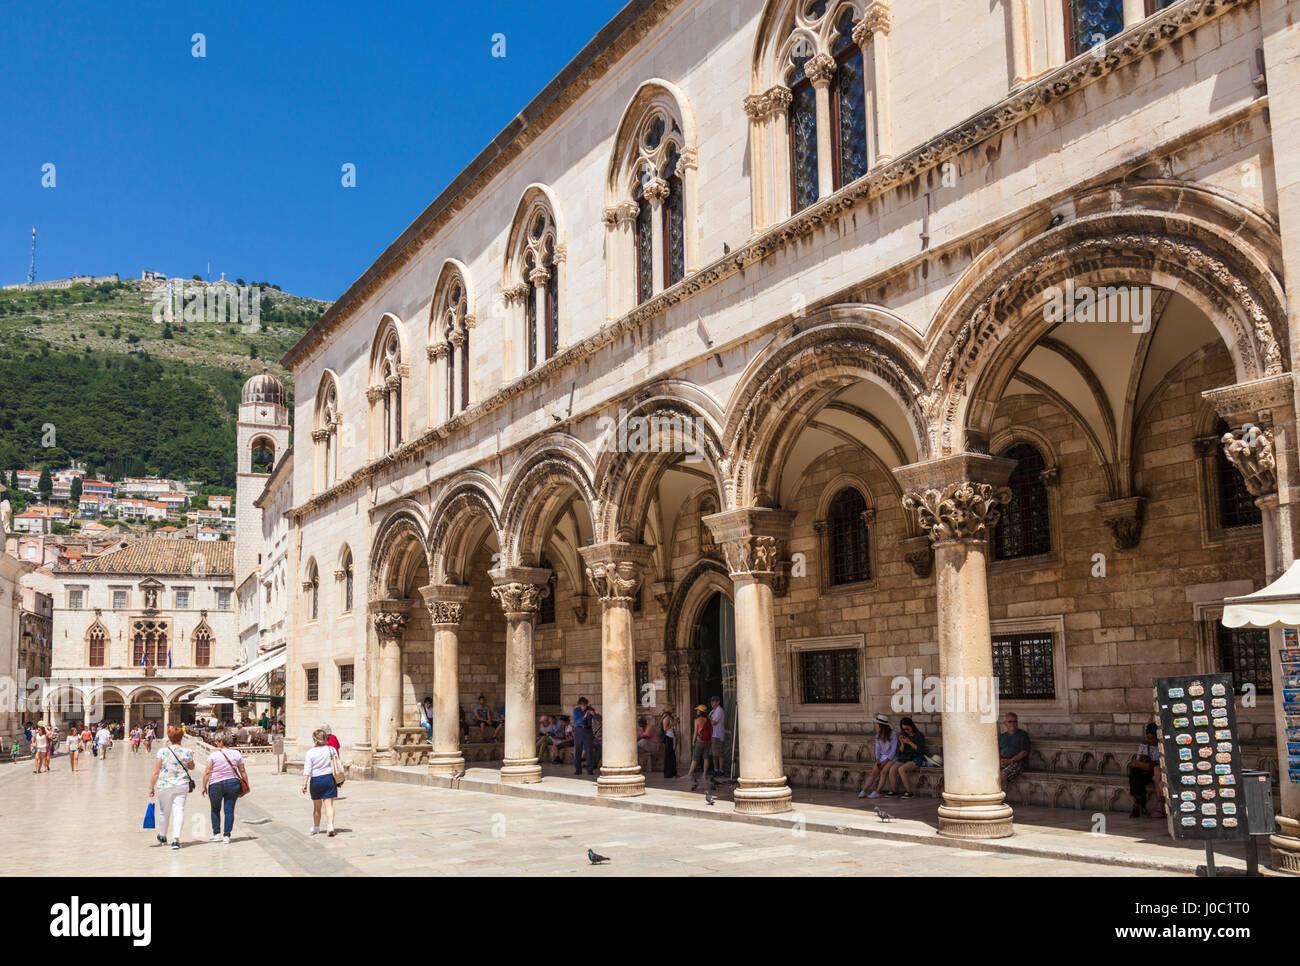 Rectors Palace and Cultural History Museum street view, Dubrovnik Old Town, Dubrovnik, Dalmatian Coast, Croatia - Stock Image